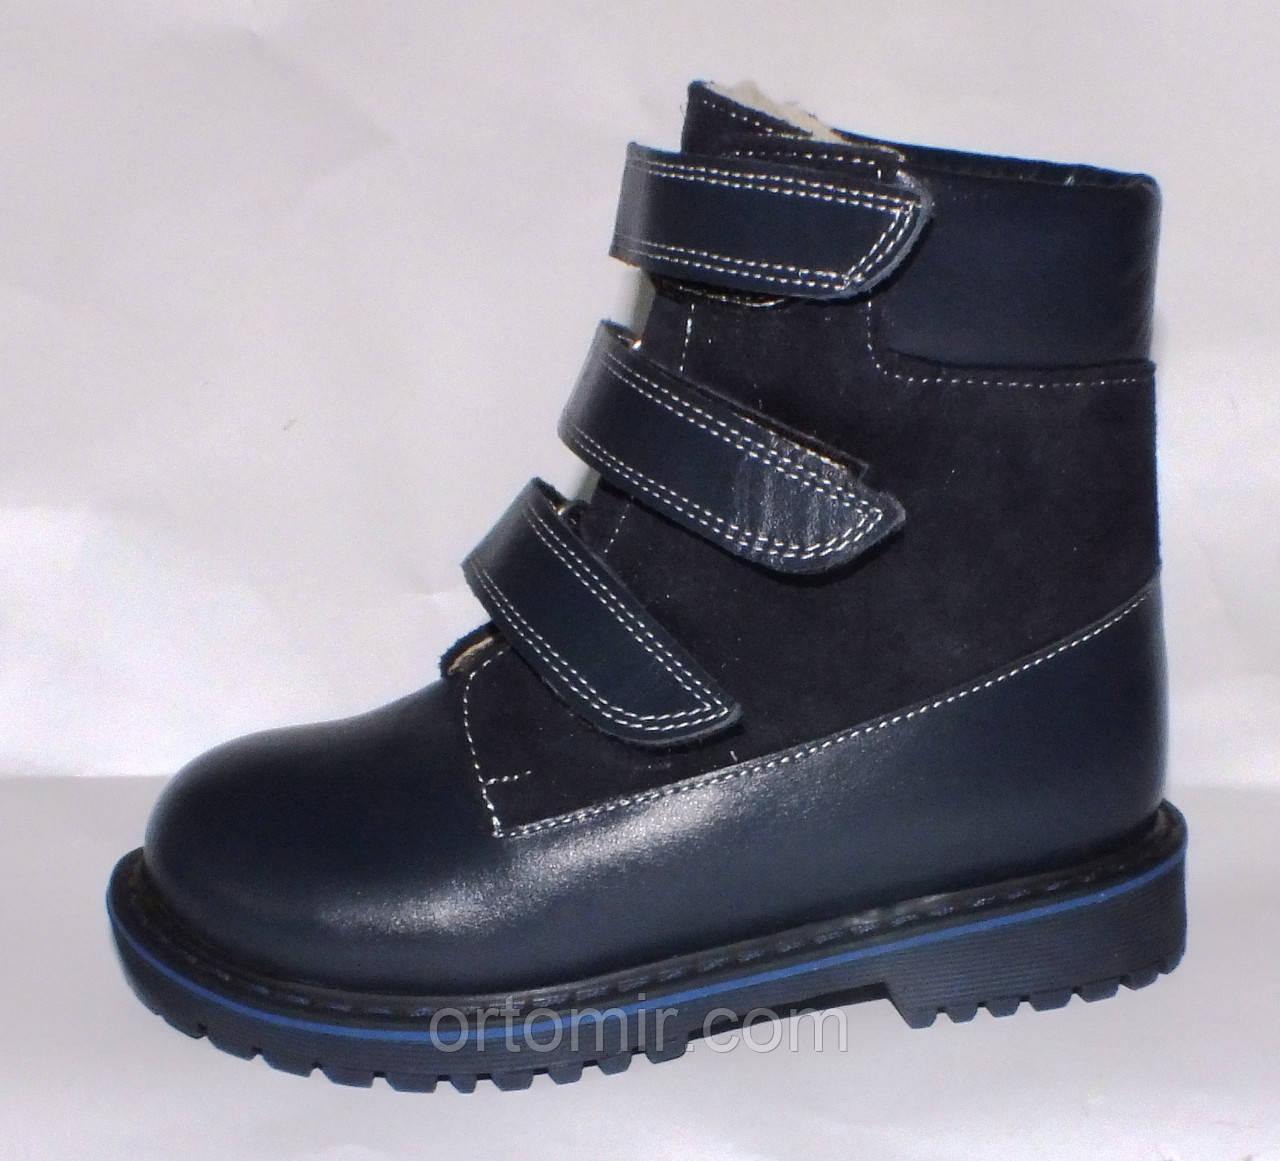 Ортопедические ботинки зима